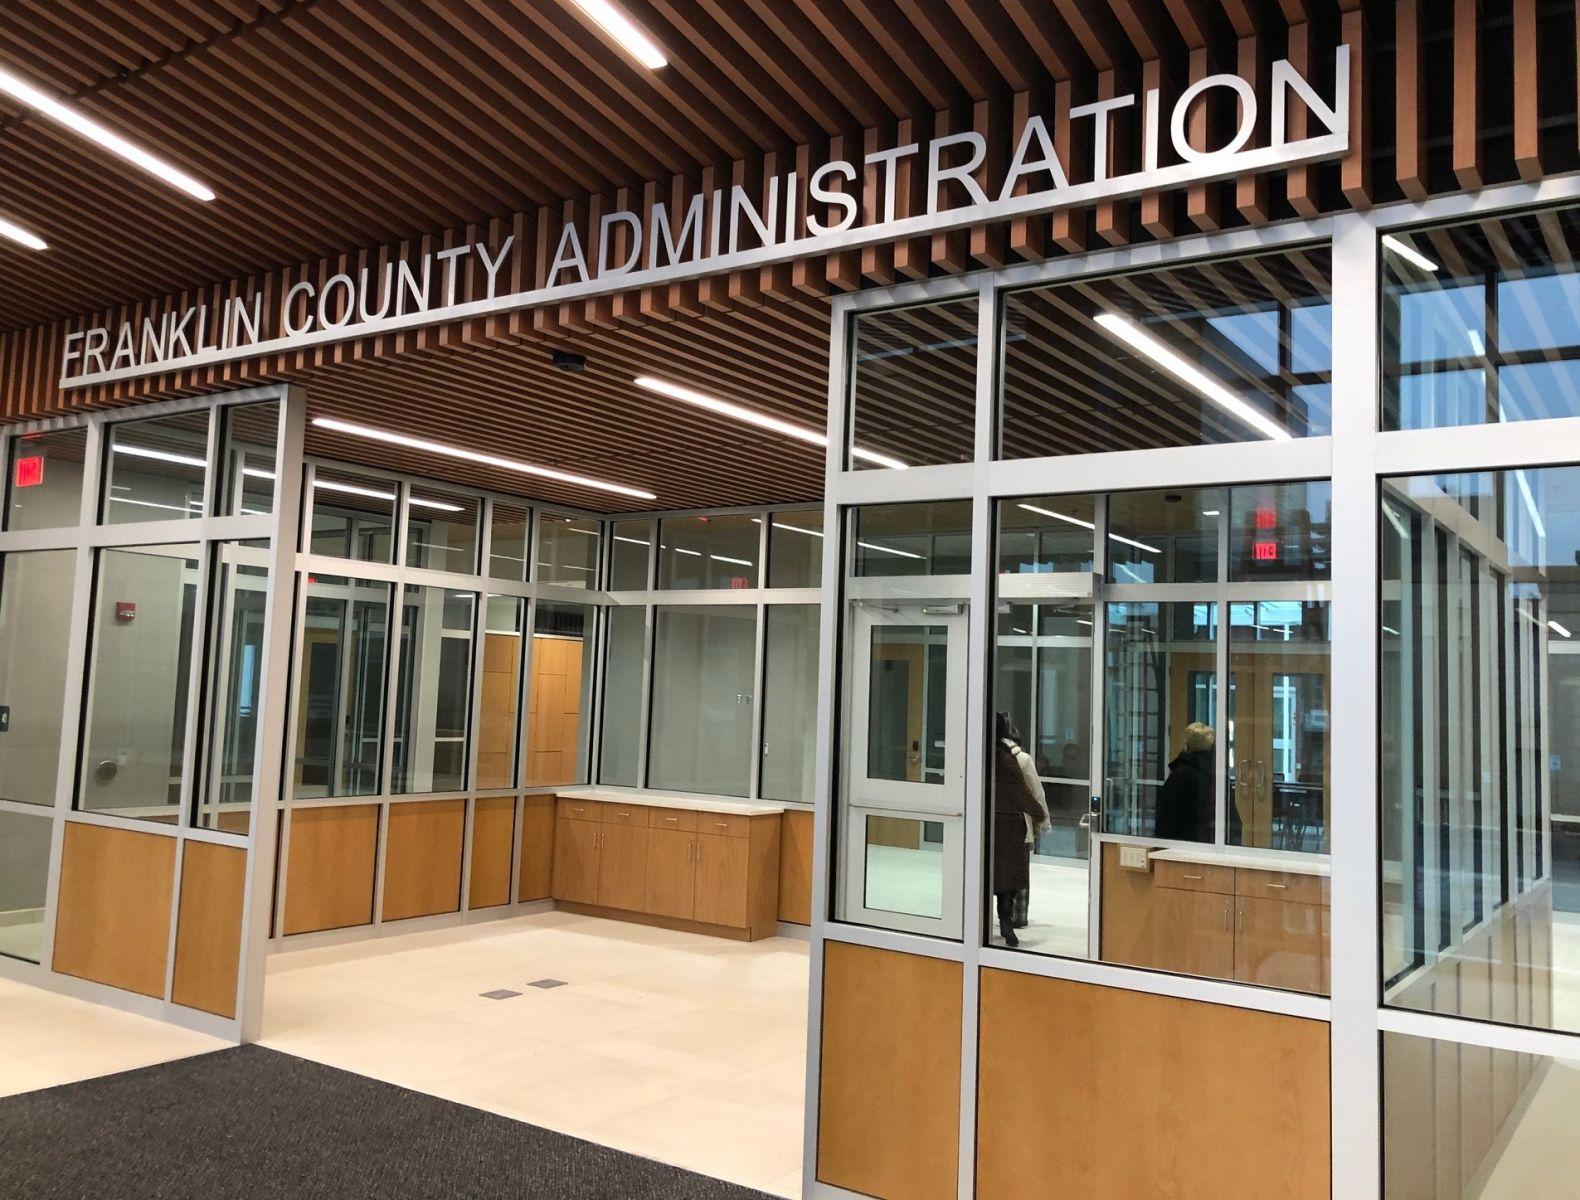 Franklin County Administration Building lobby, 1-26-2021